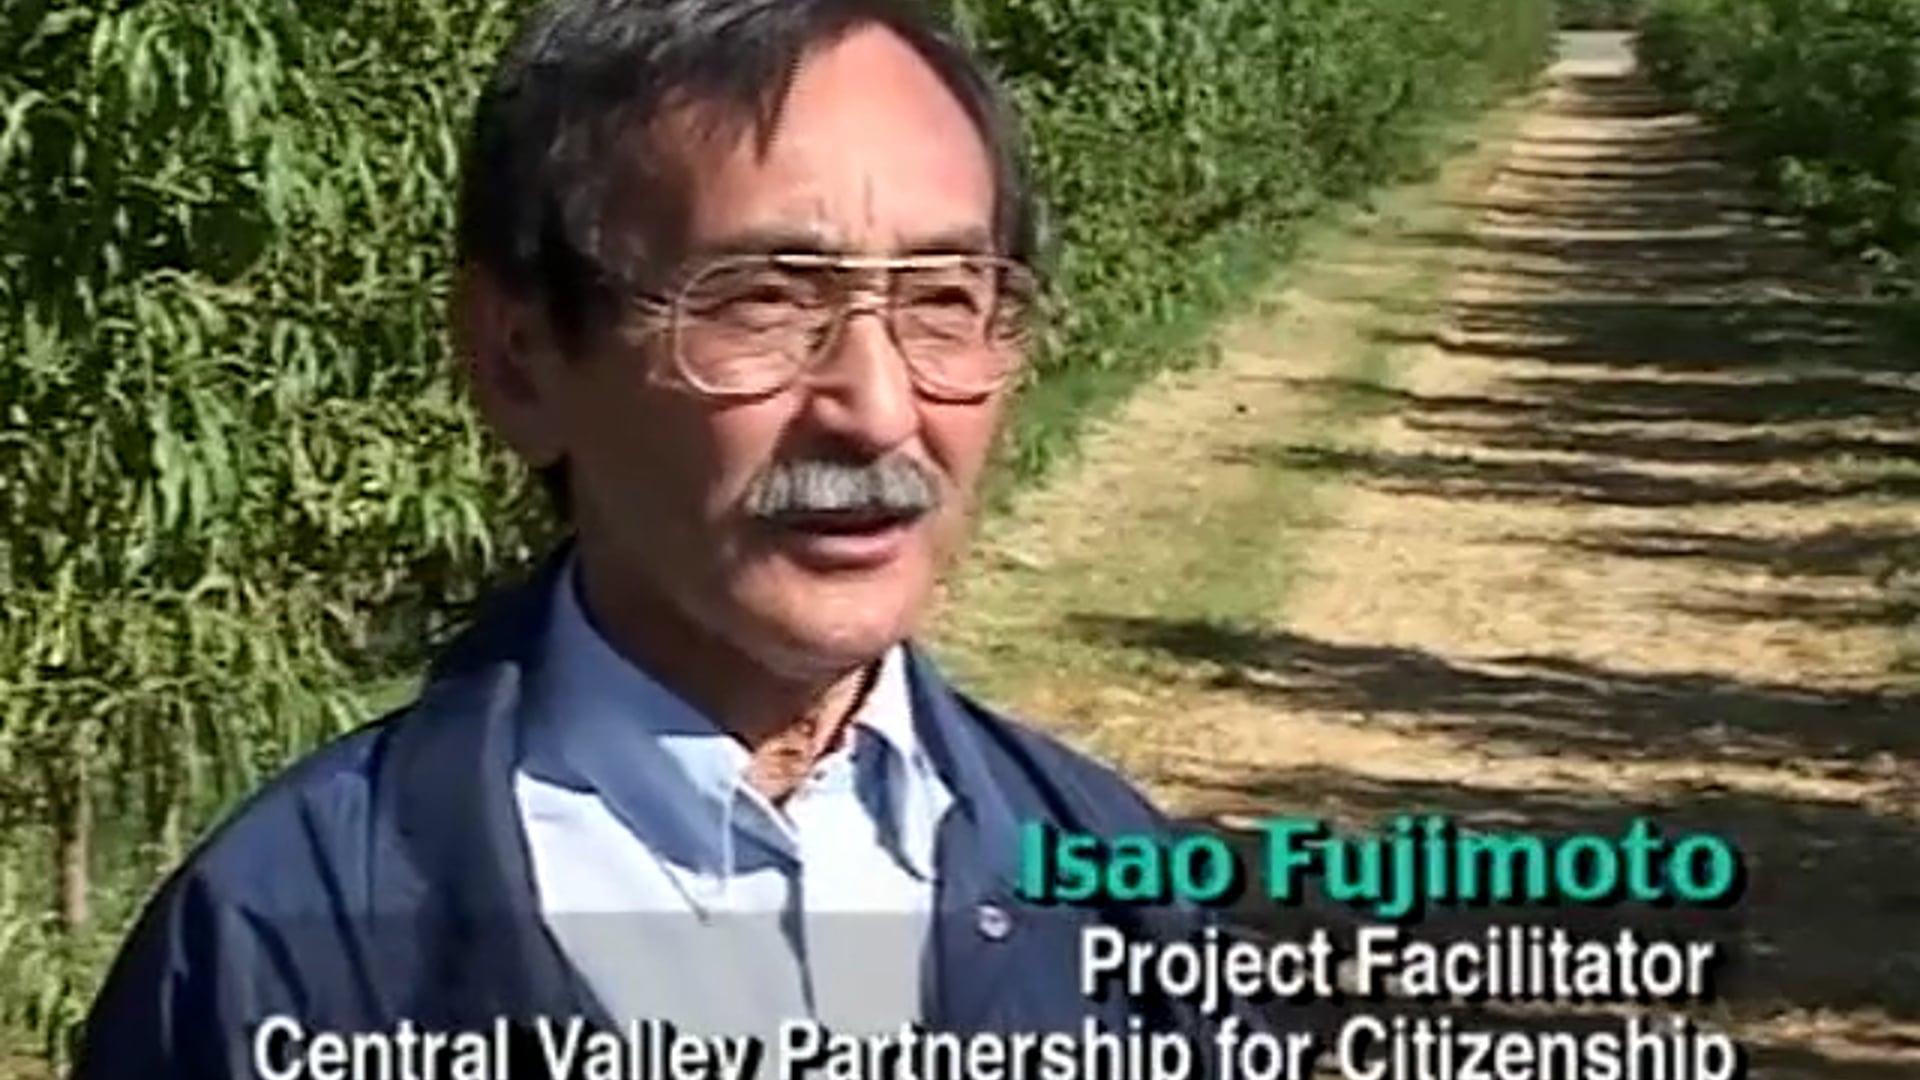 Isao Fujimoto CVP Overview